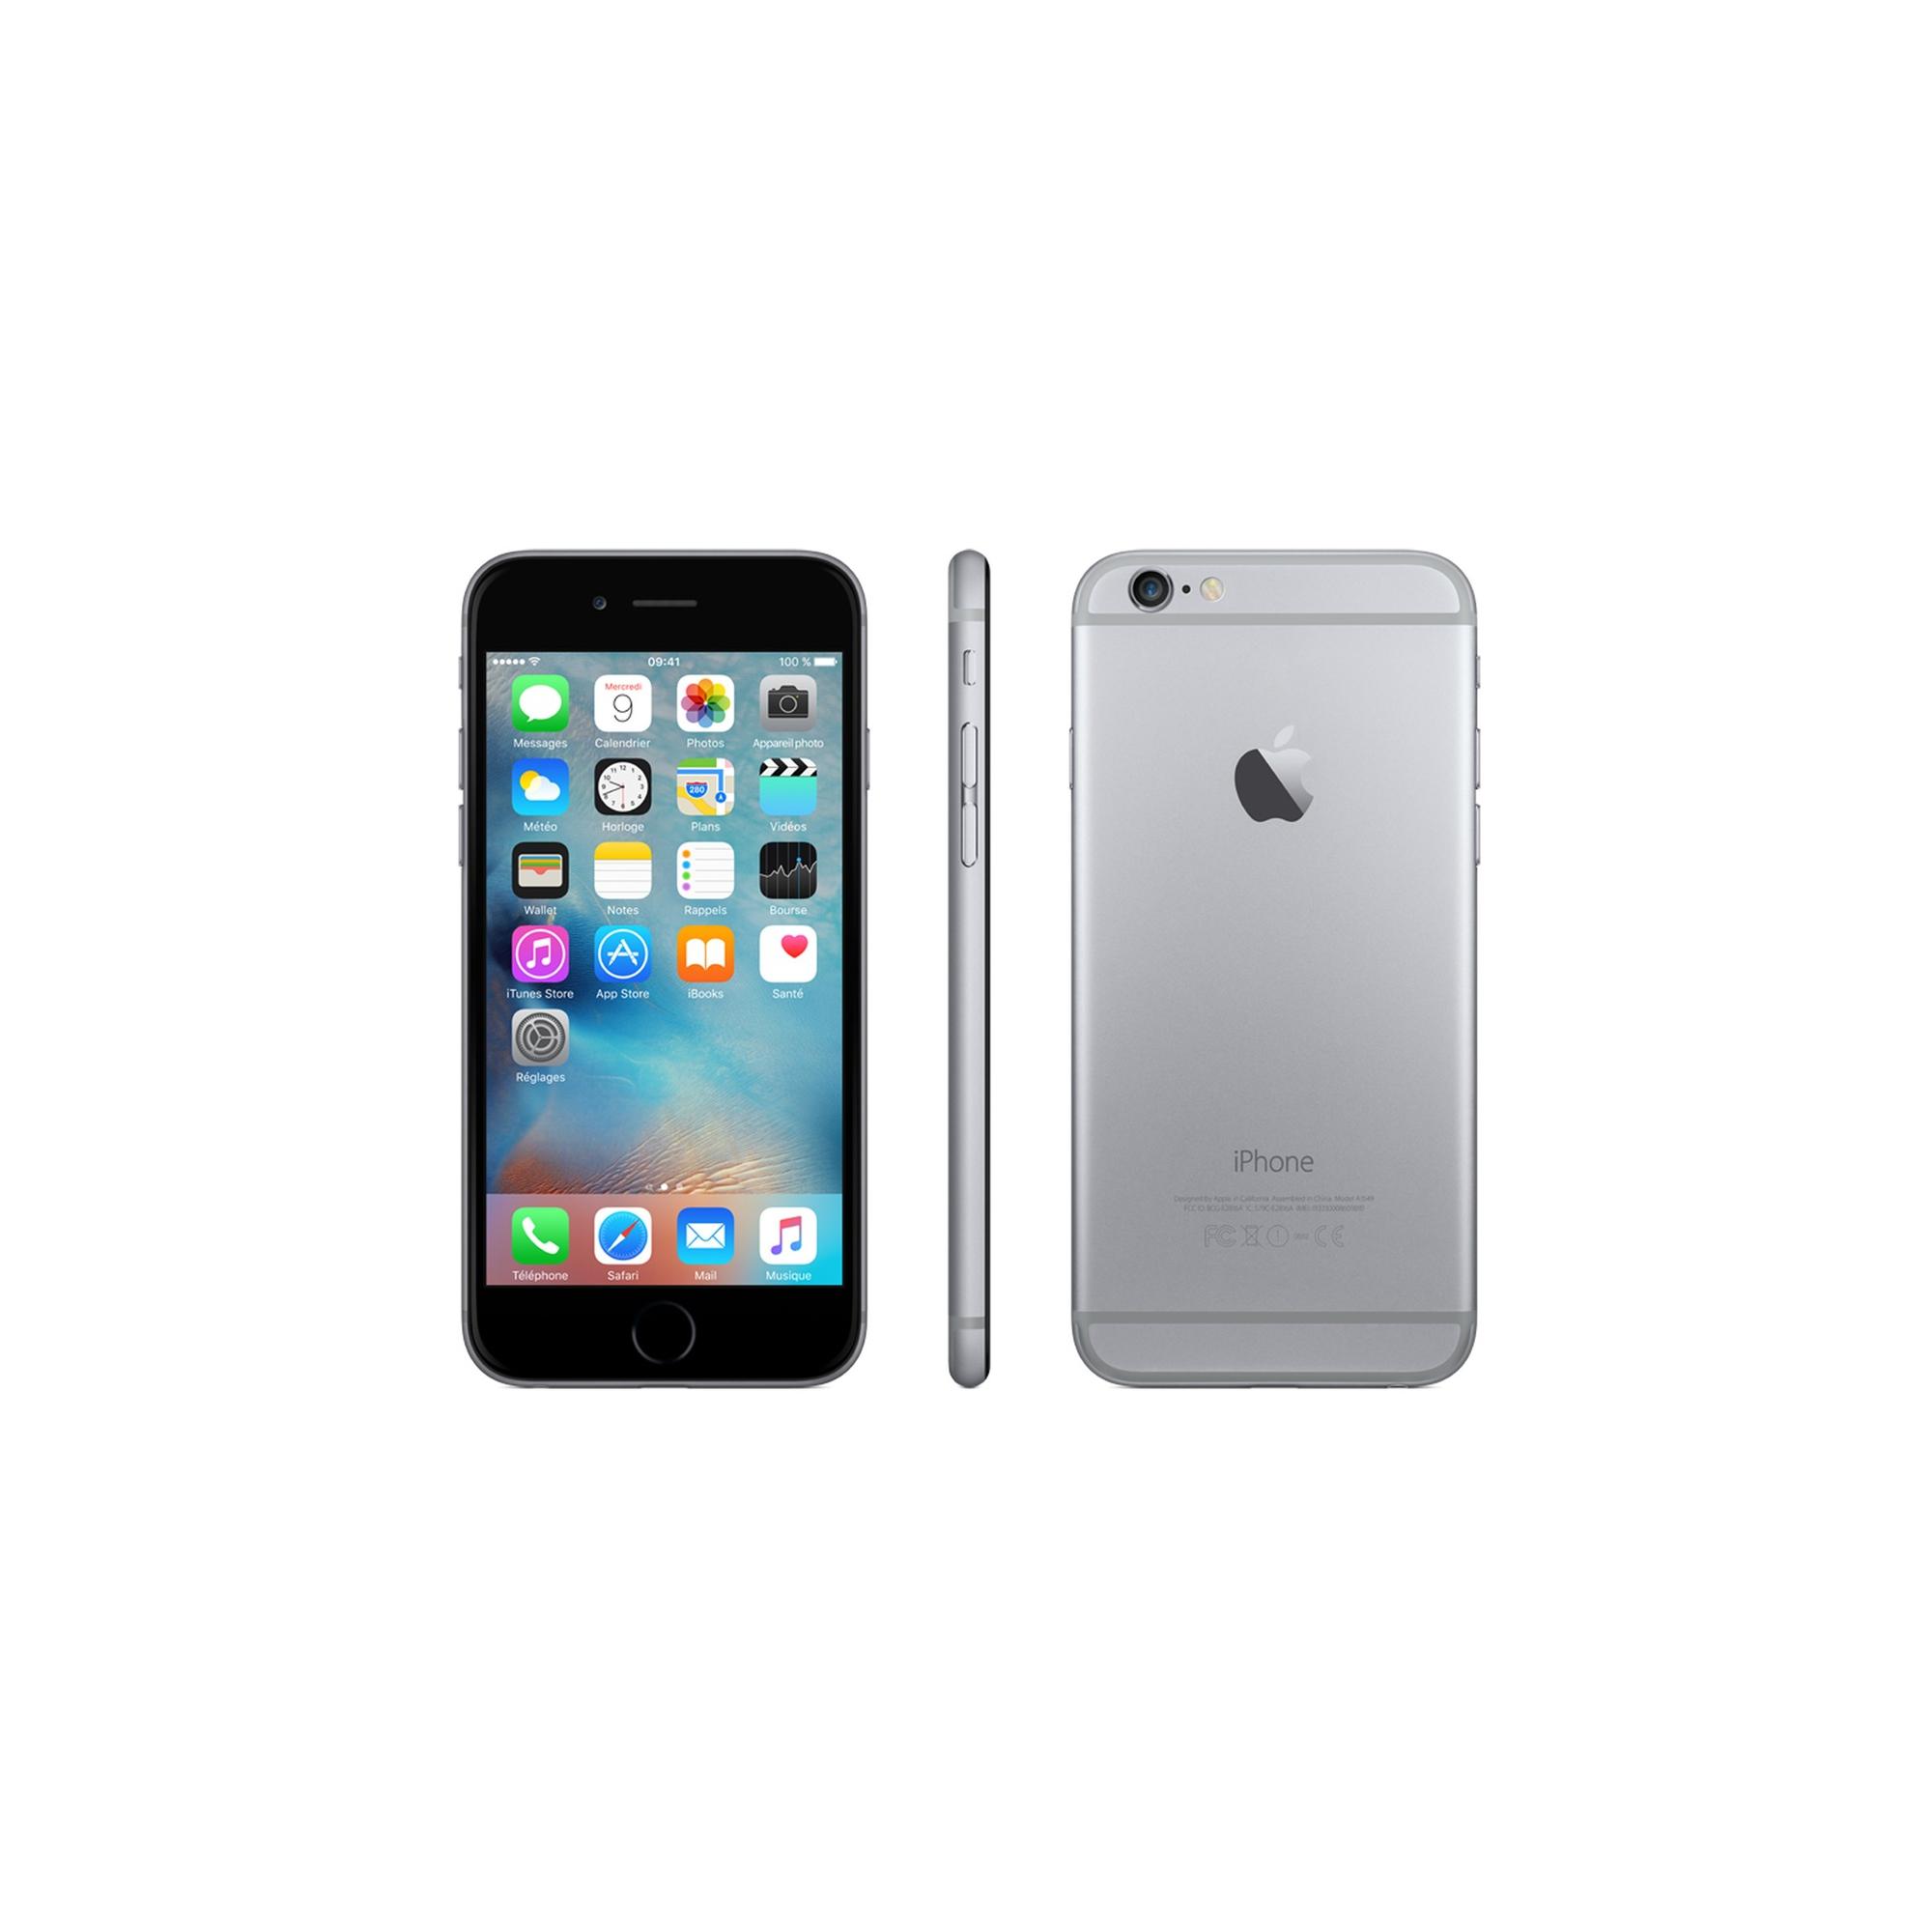 iPhone 6 - Axydis Distributeur SFR Business